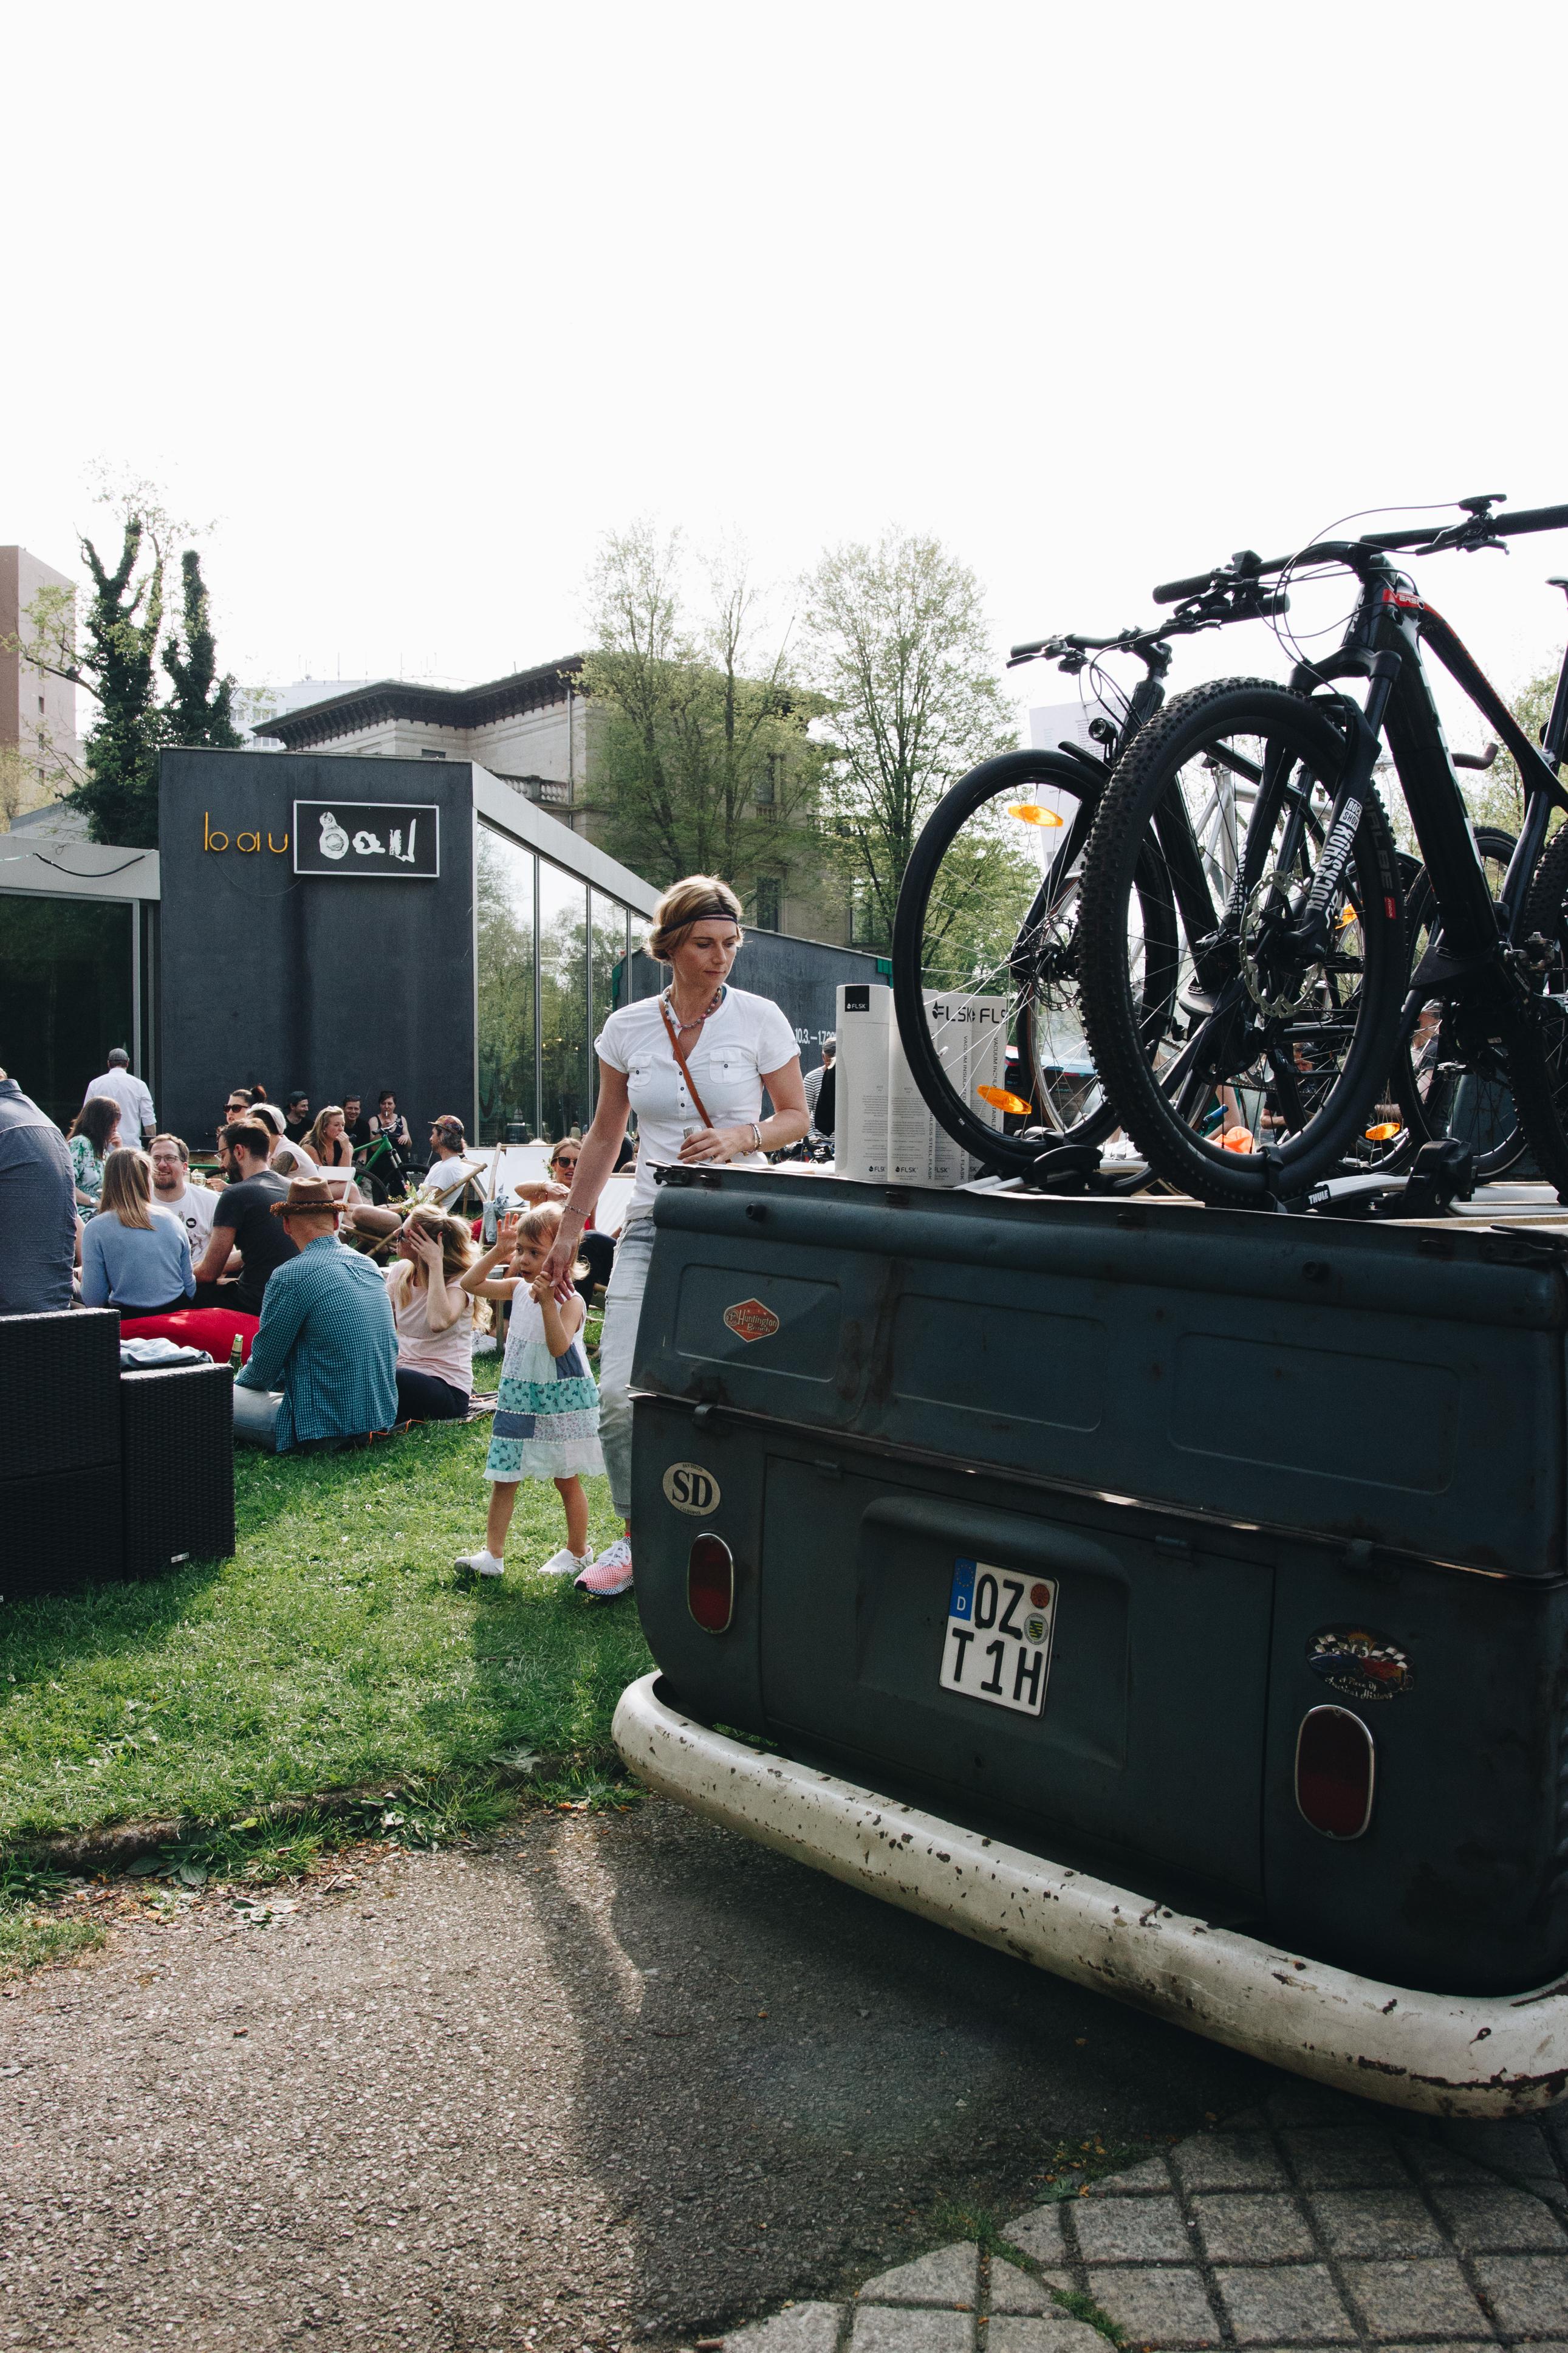 we ride leipzig-release party-leipzig-cafe bau bau-annabelle sagt18